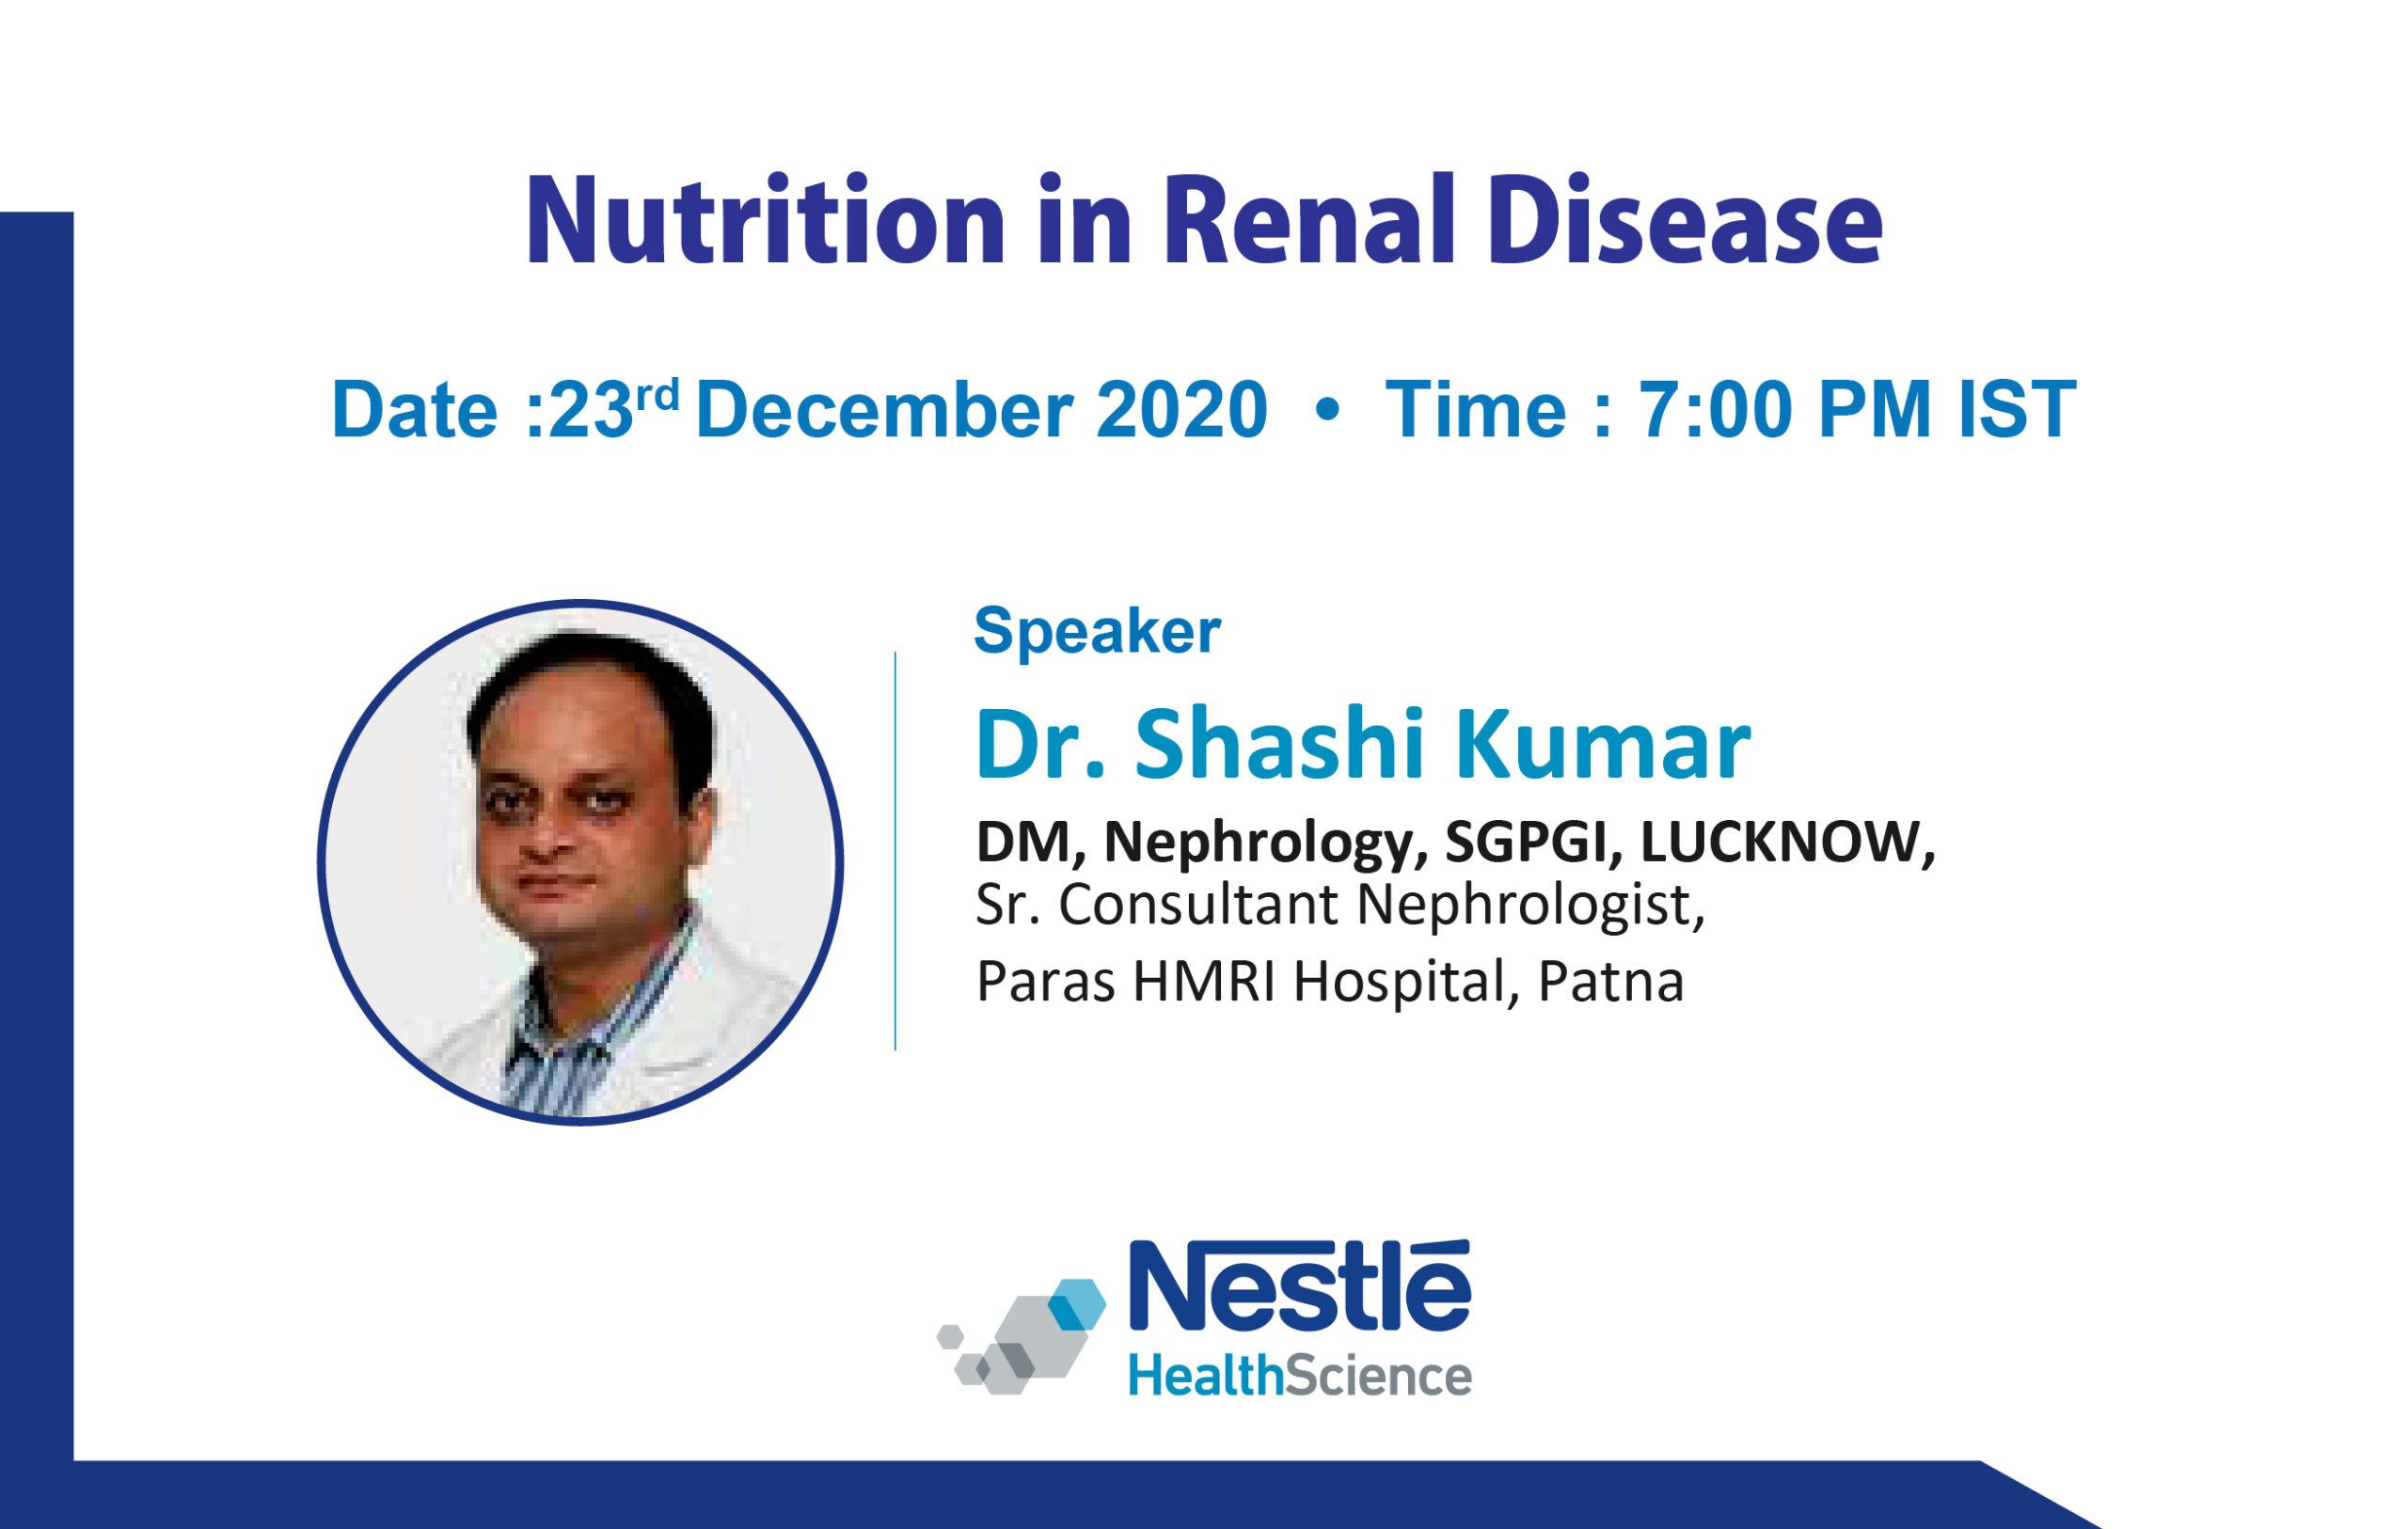 Nutrition in Renal Disease